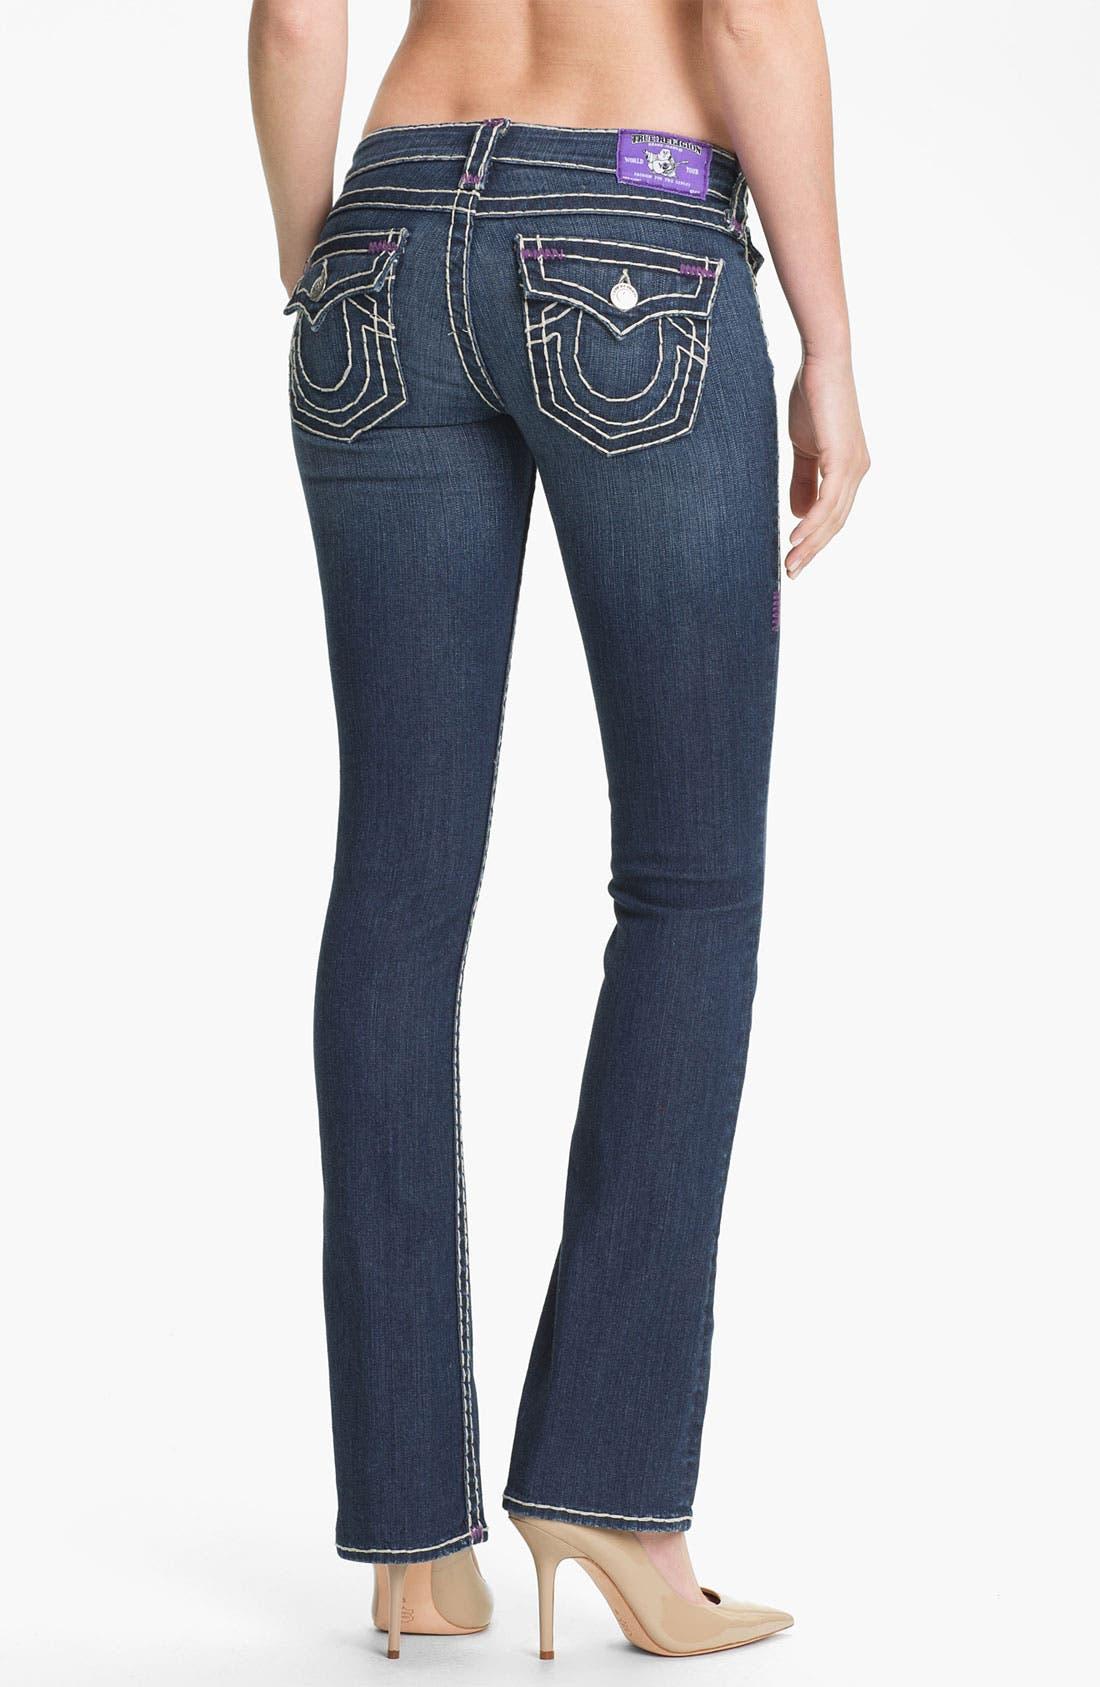 Alternate Image 2  - True Religion Brand Jeans 'Becky' Bootcut Jeans (Memphis)